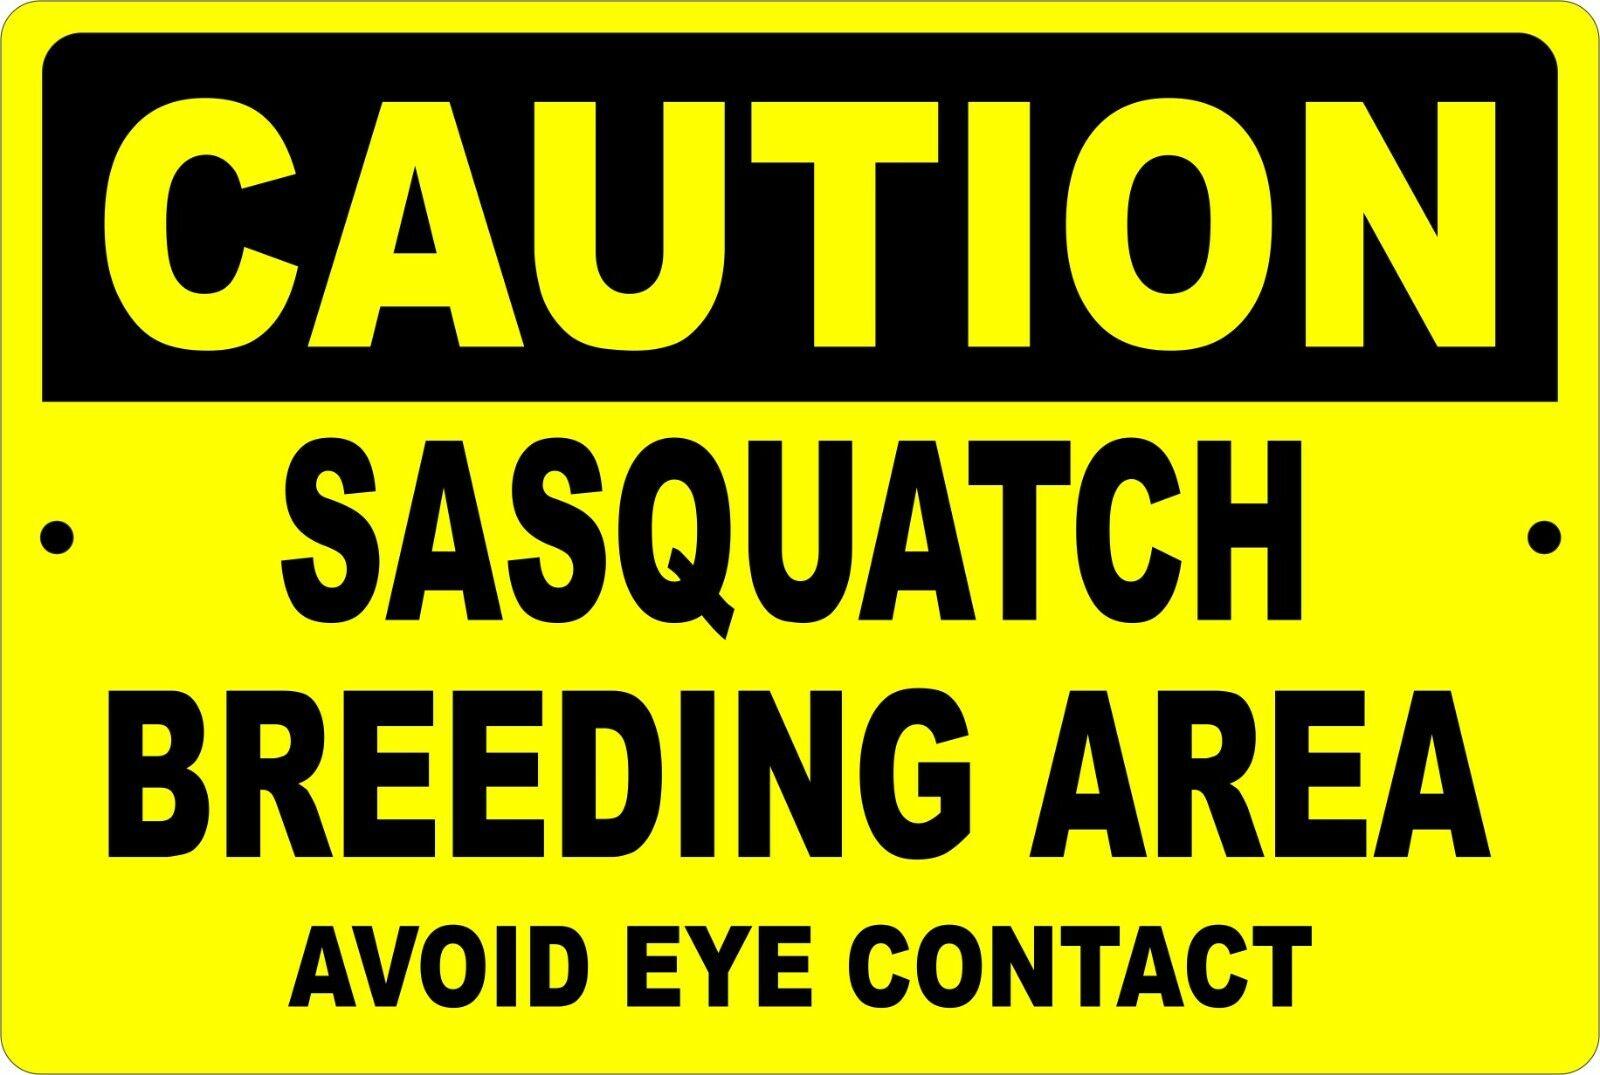 Caution Sasquatch Breeding Area 8